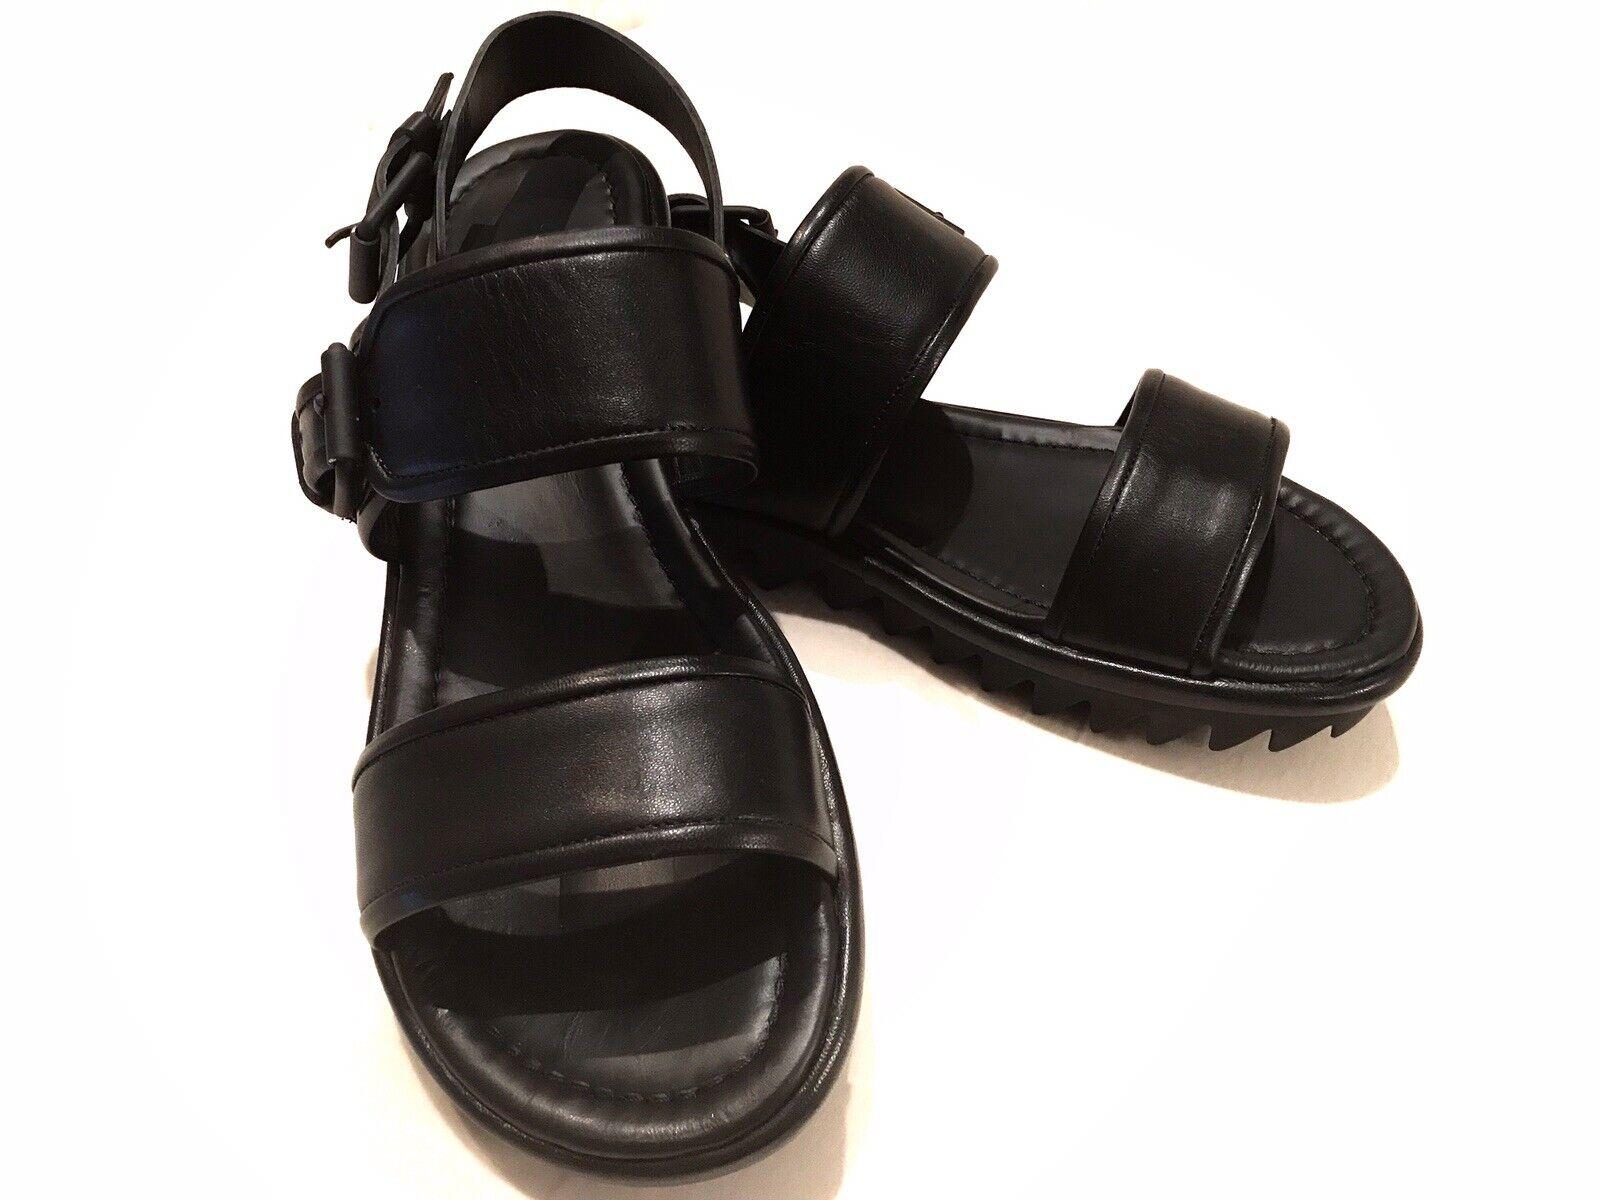 Giuseppe Zanotti Men's Sandals Size 44